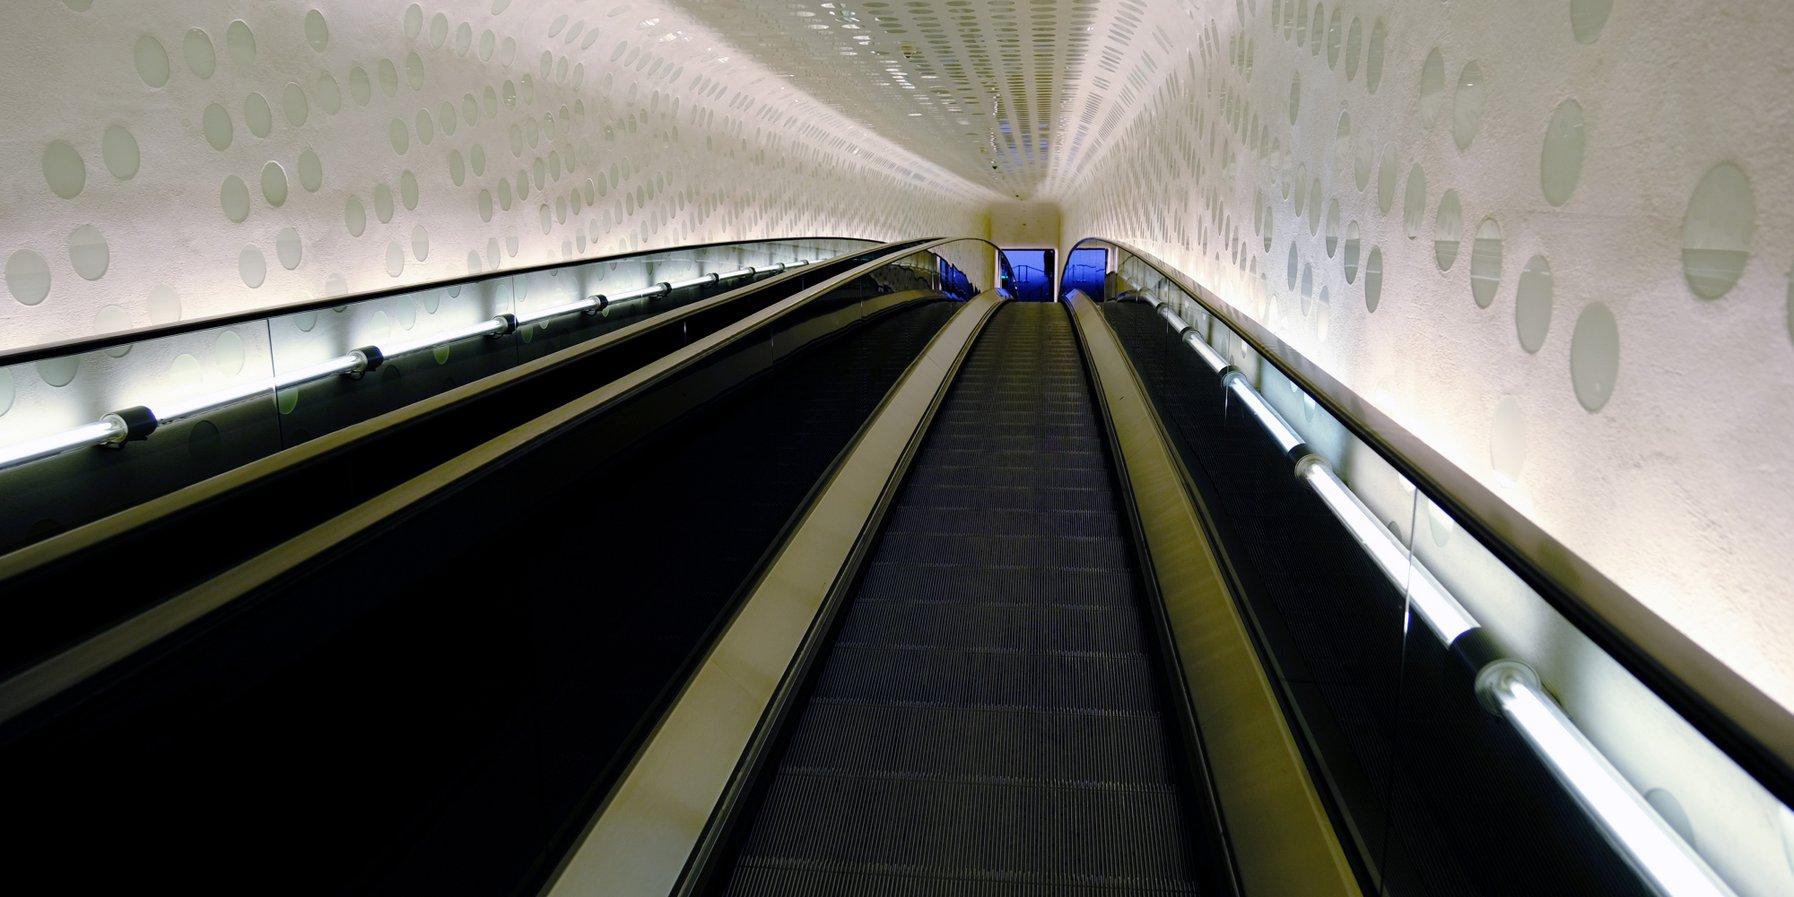 Elbphilharmonie Tube